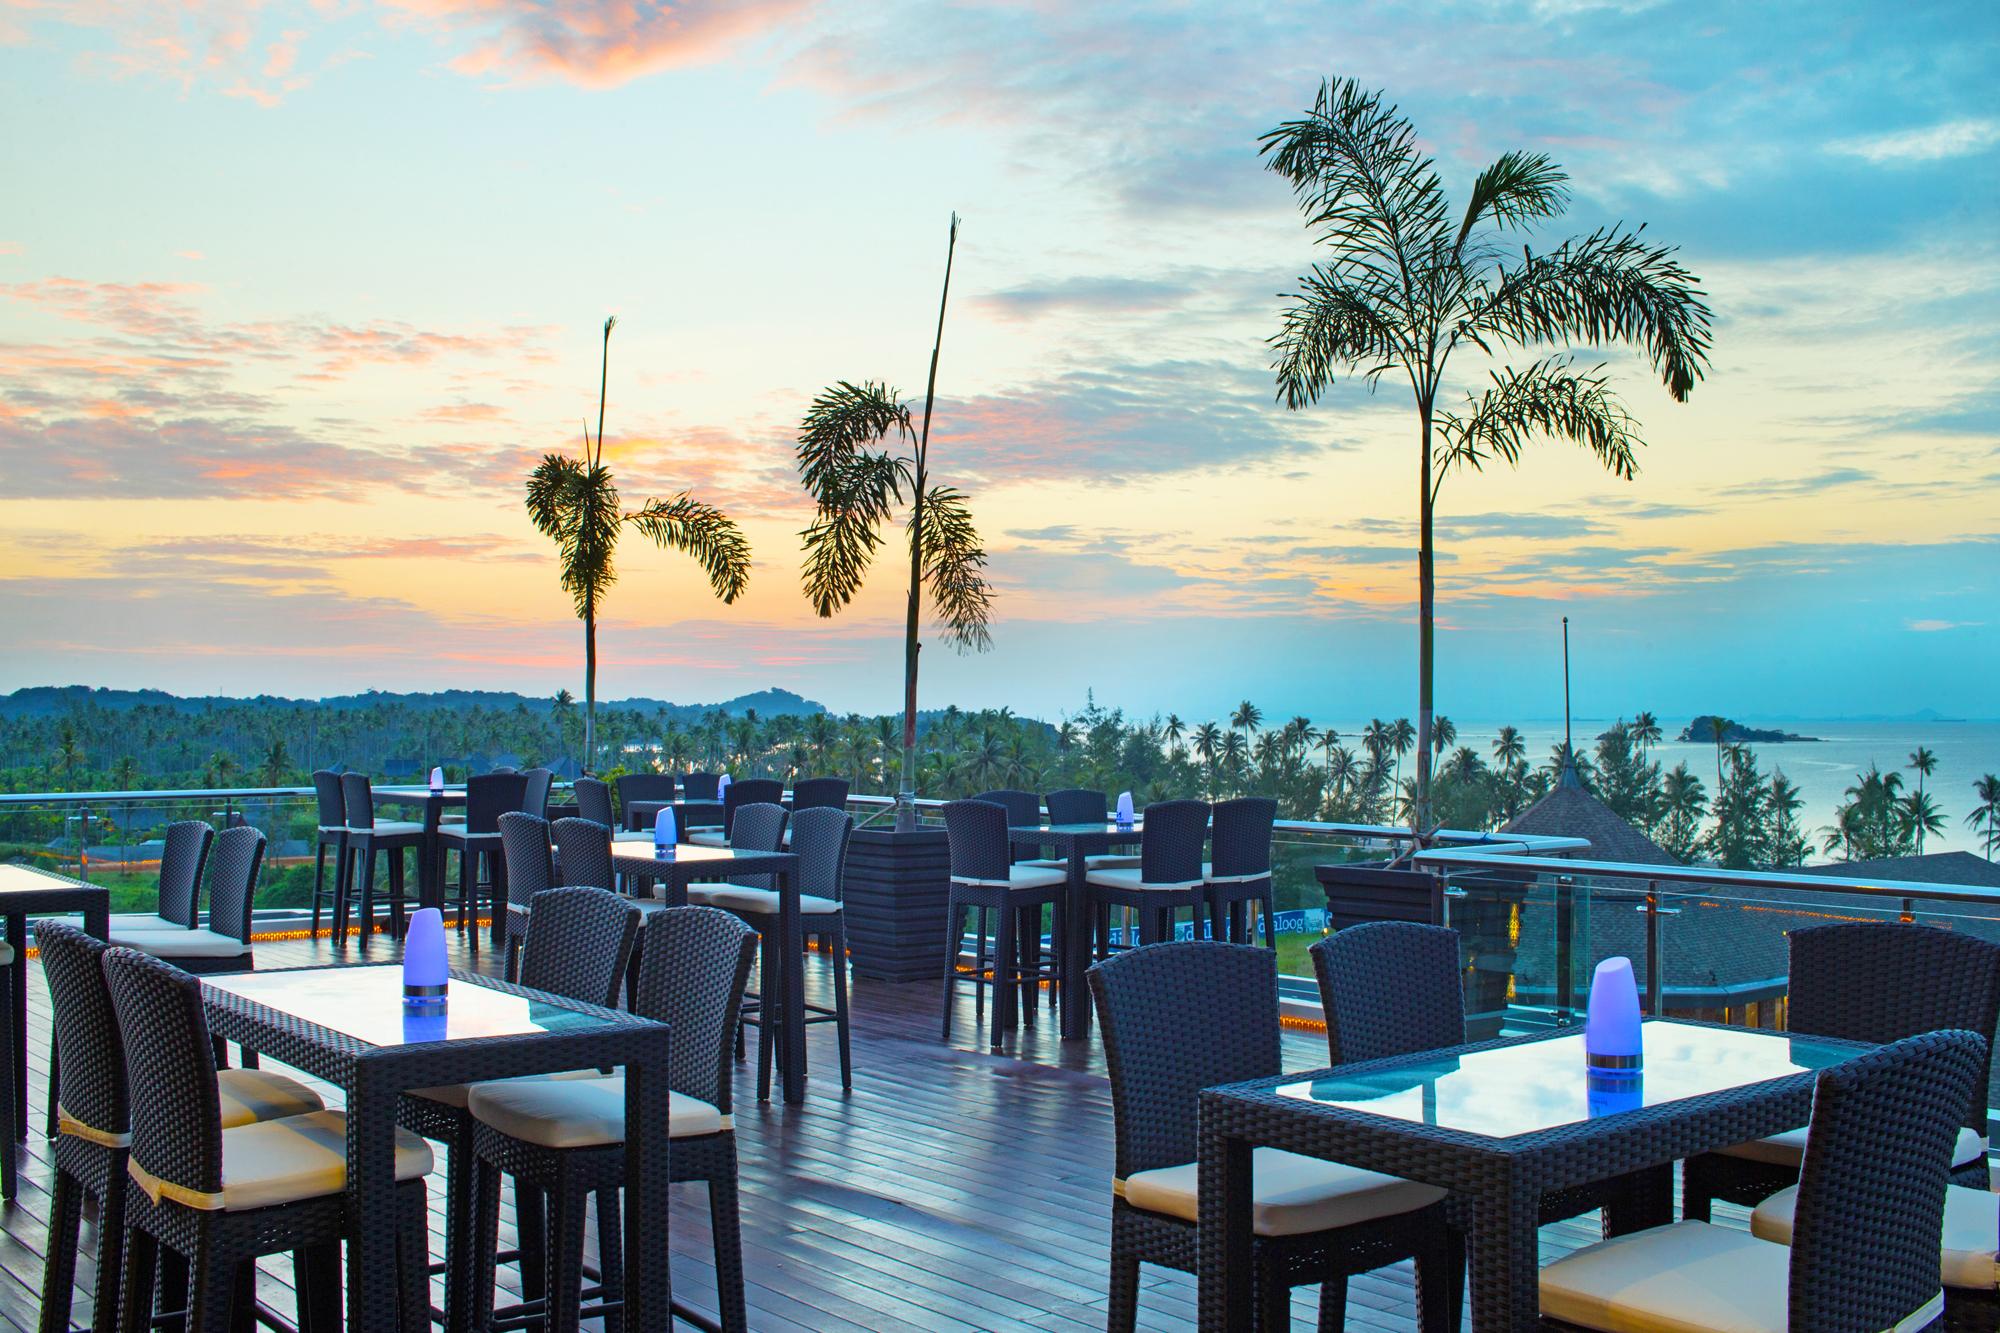 Grand Lagoi Hotel by Nirwana Gardens, Bintan